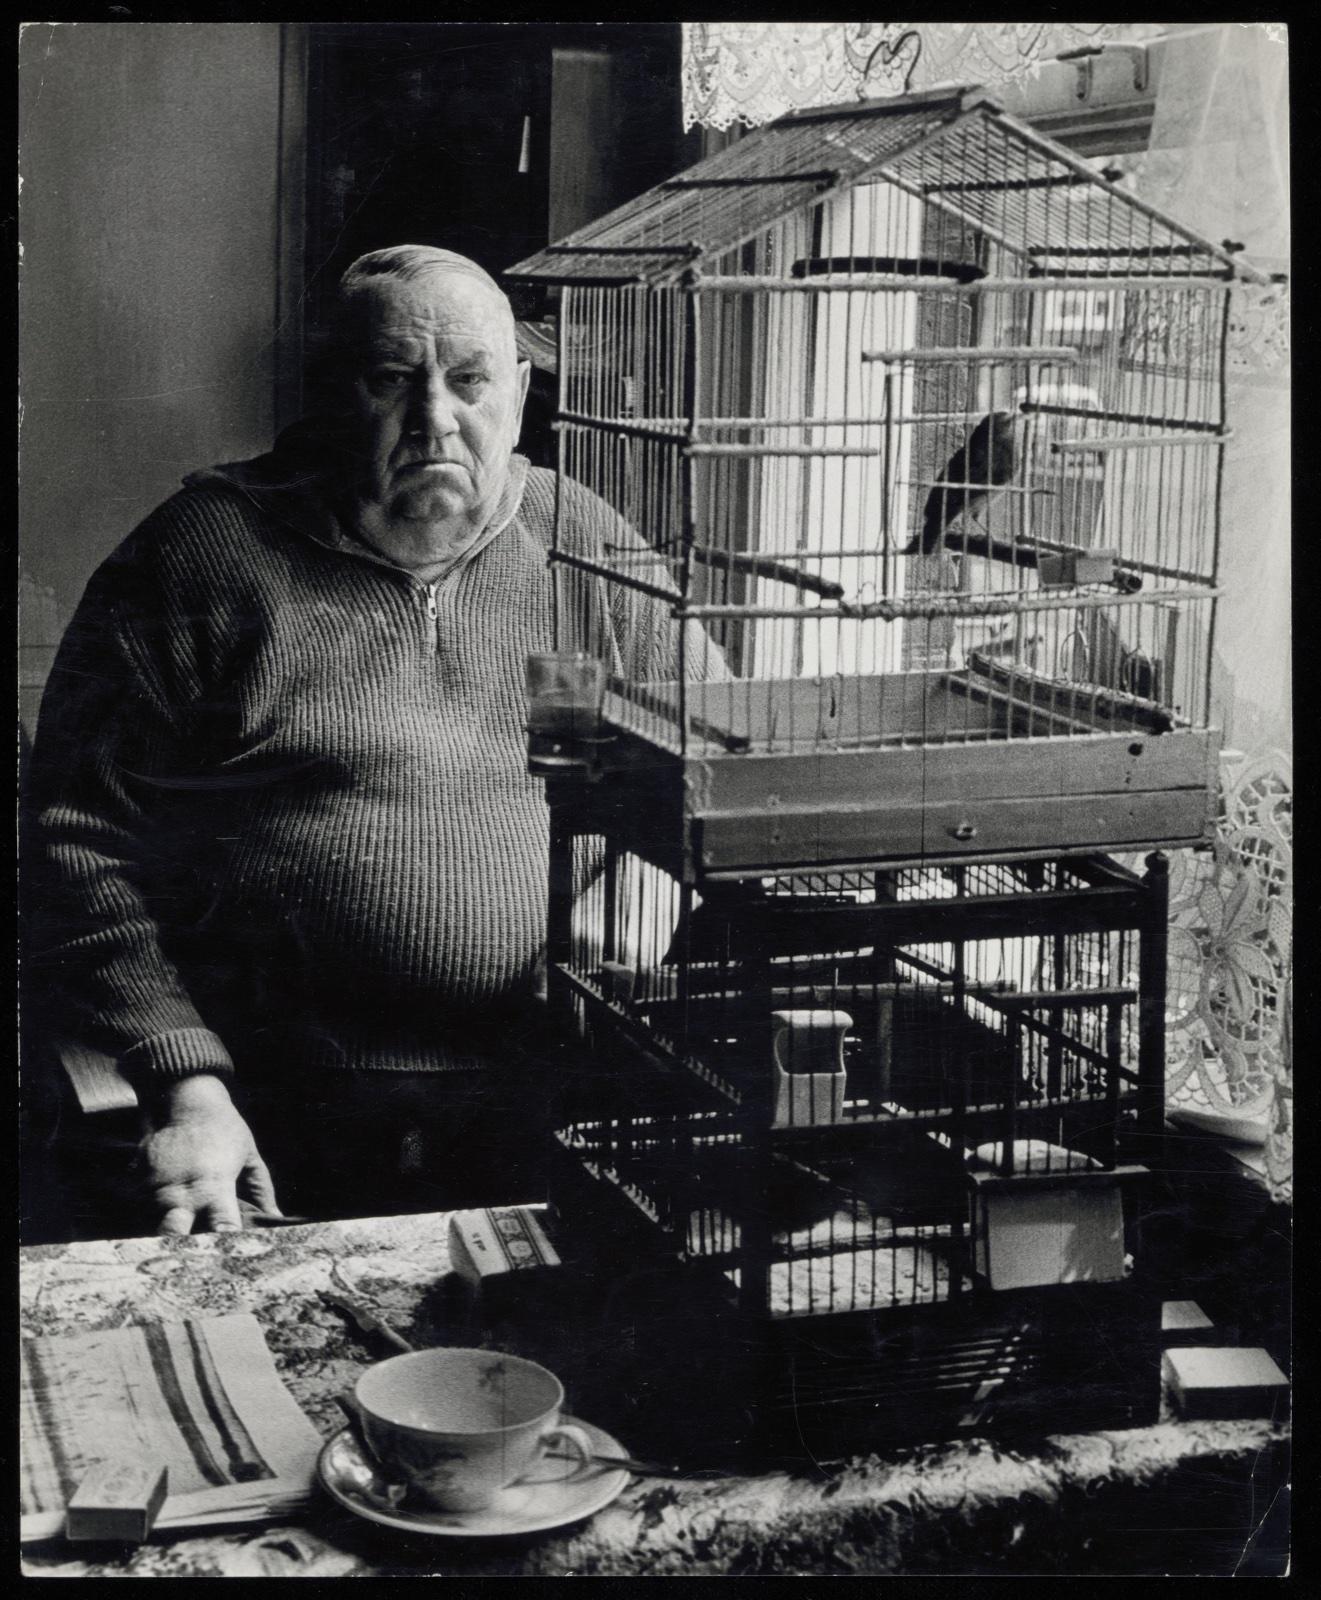 foto: Dolf Toussaint - Oud-koetsier Leonardus Johannes Worrel, Westerkade 6, ca. 1963